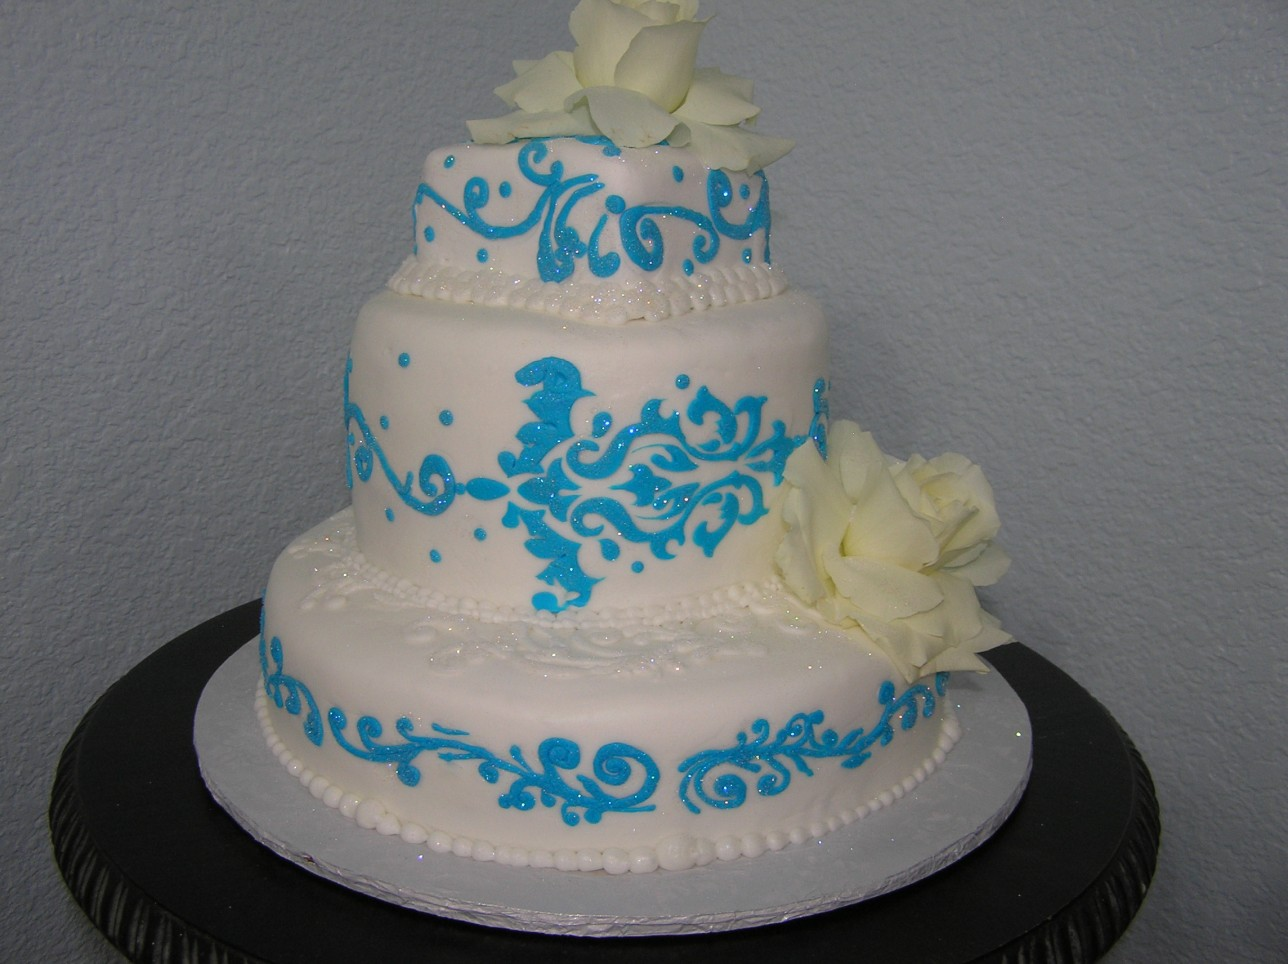 Teal Overlay Cake